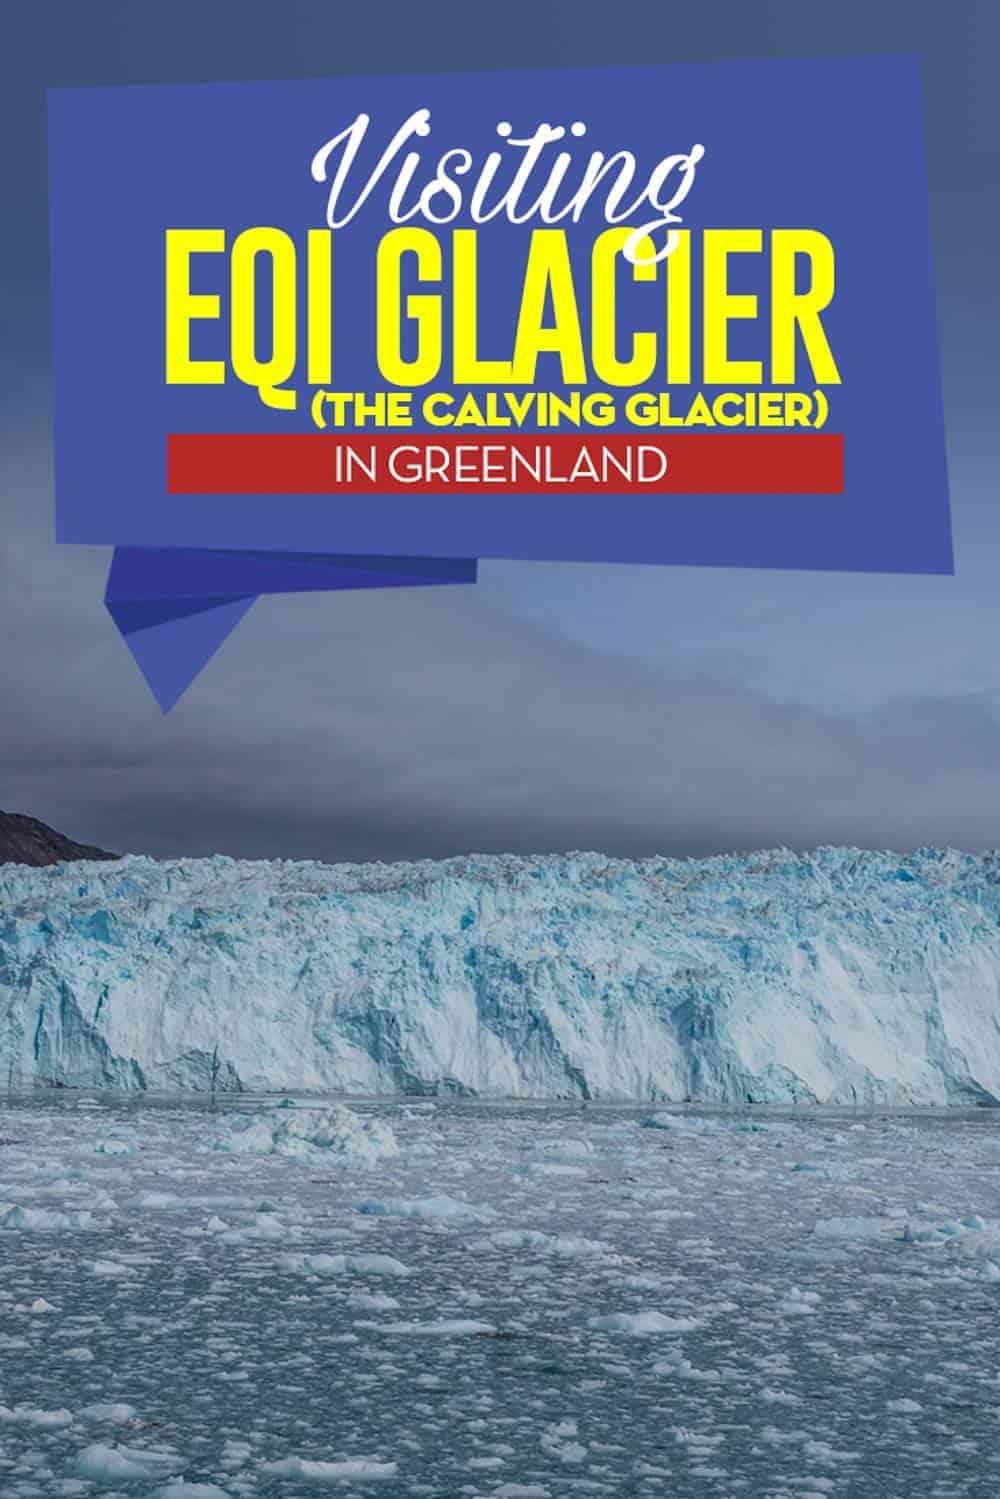 Ilulissat,Greenland,ice fjord,eqi glacier,north america,icebergs